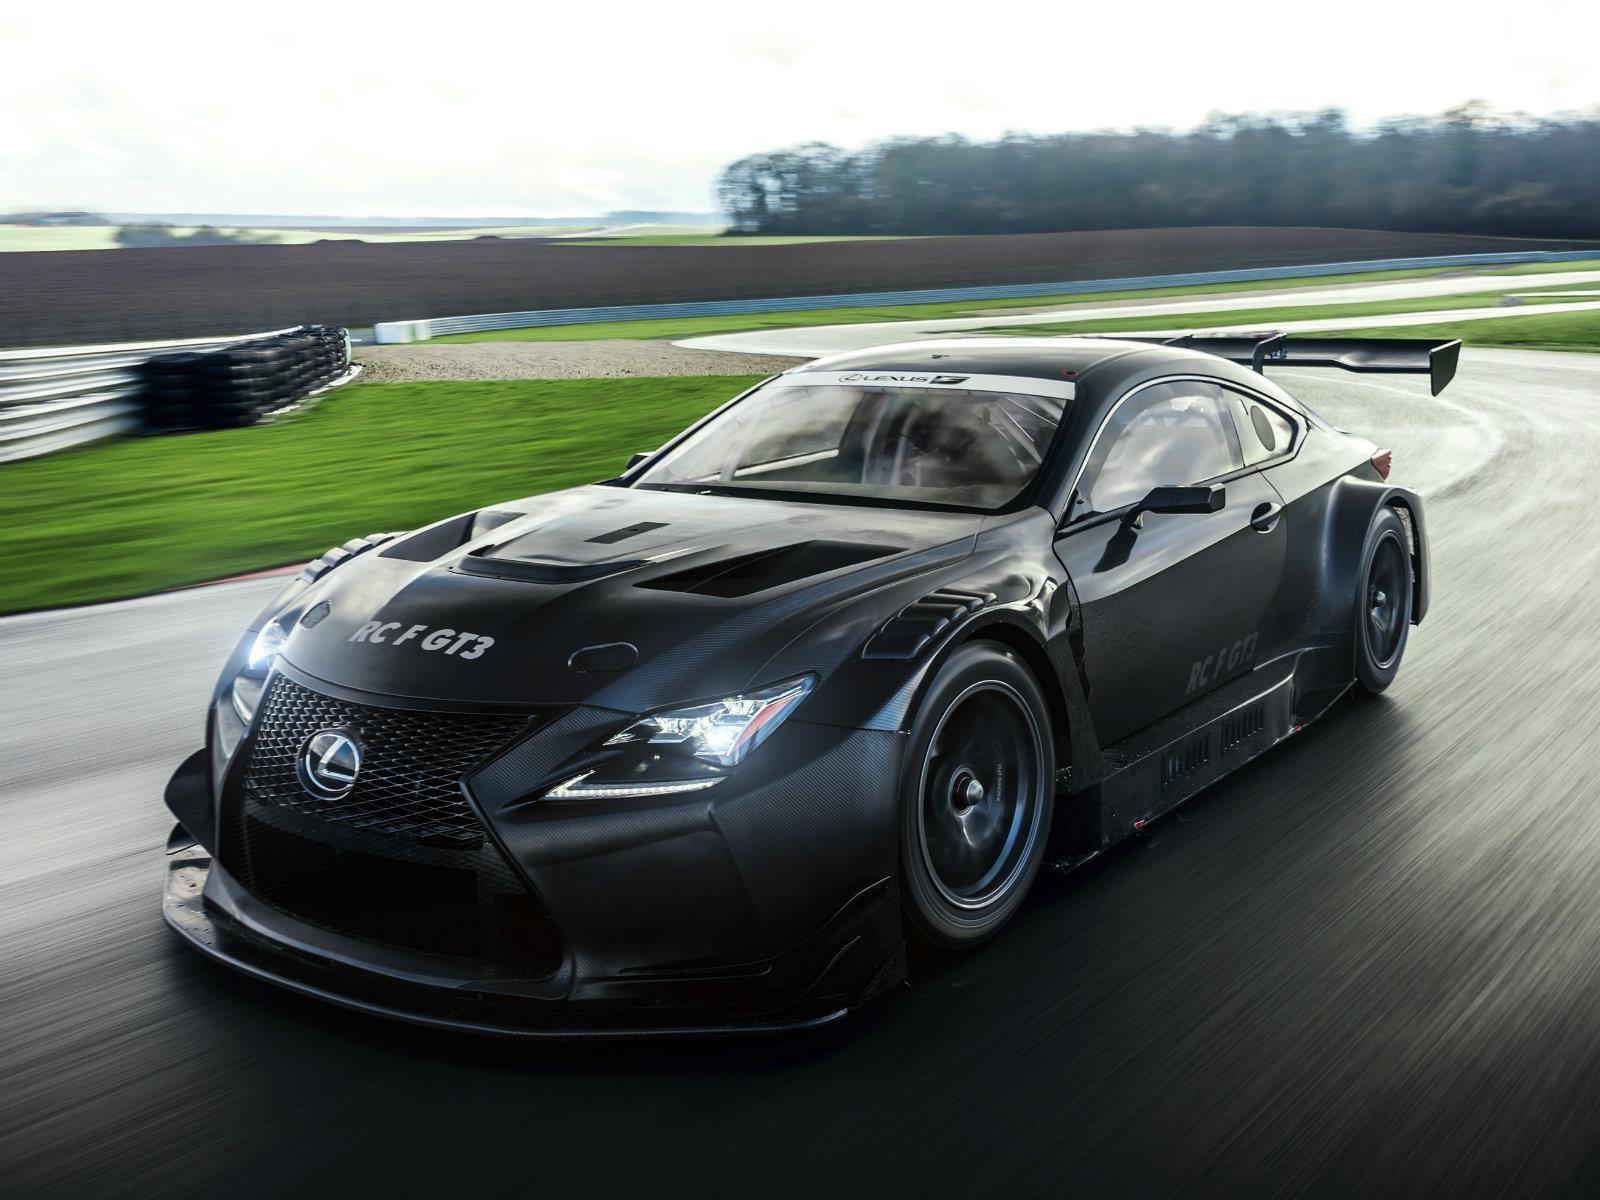 Lexus RC F GT3, listo para salir a la pista